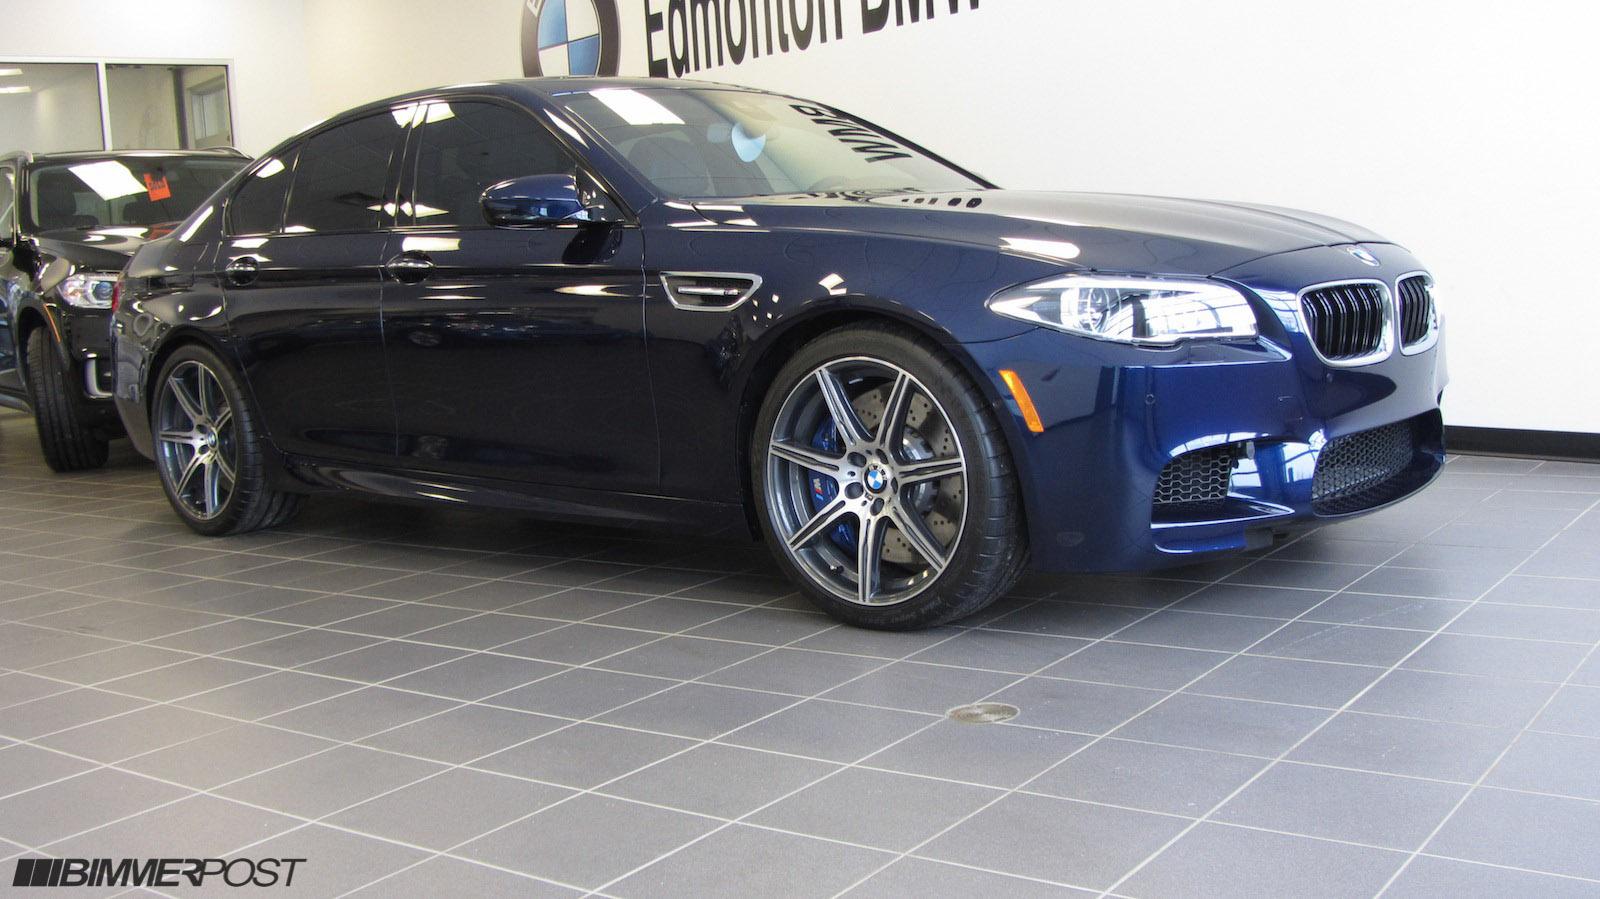 BMW Columbia Sc >> BMW Individual Tanzanite Blue & Cohiba Brown F10 M5 ...